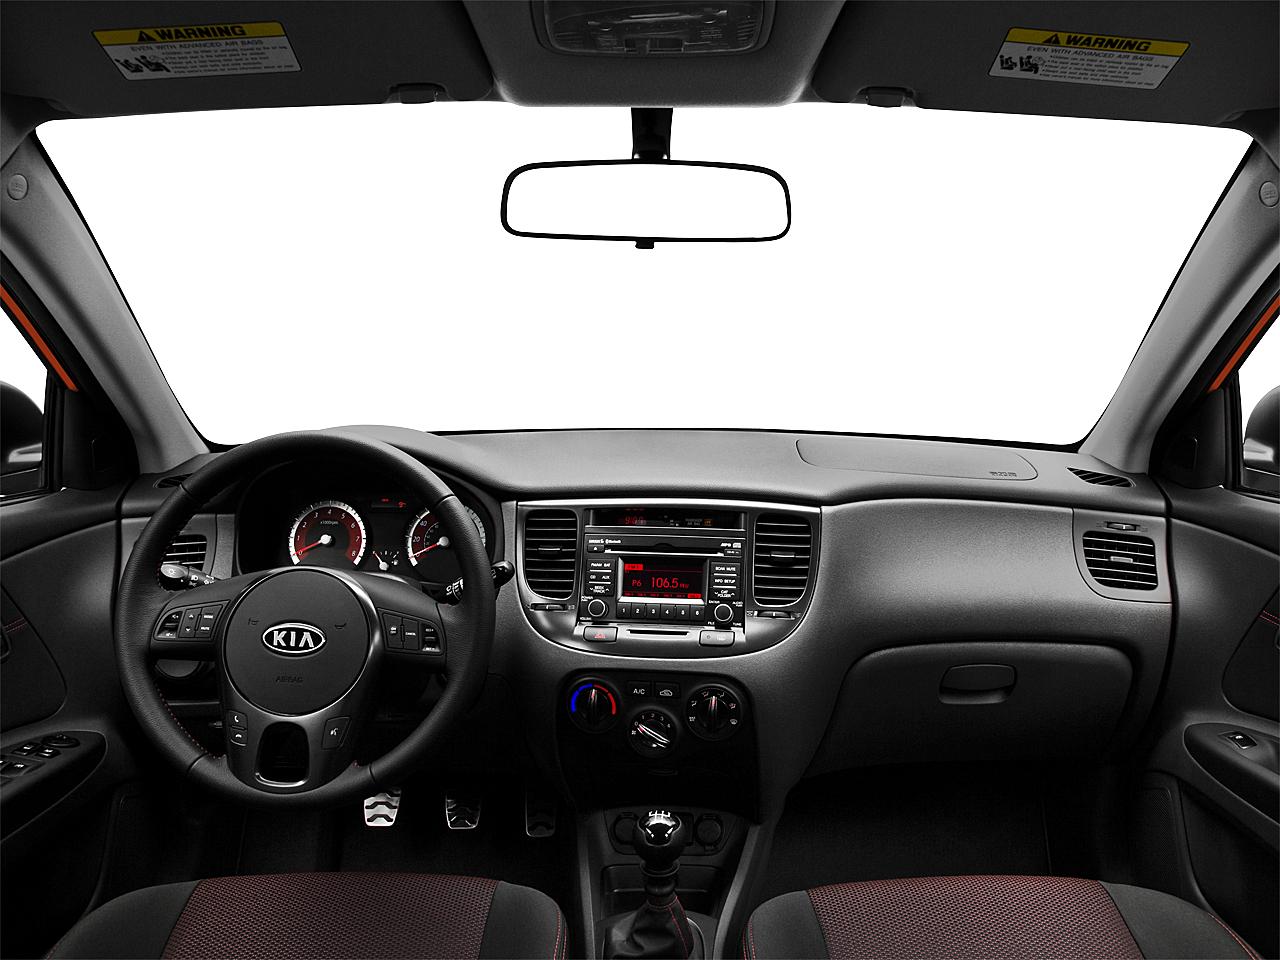 2010 Kia Rio5 Sx 4dr Wagon 5m Research Groovecar Centered Wide Dash Shot